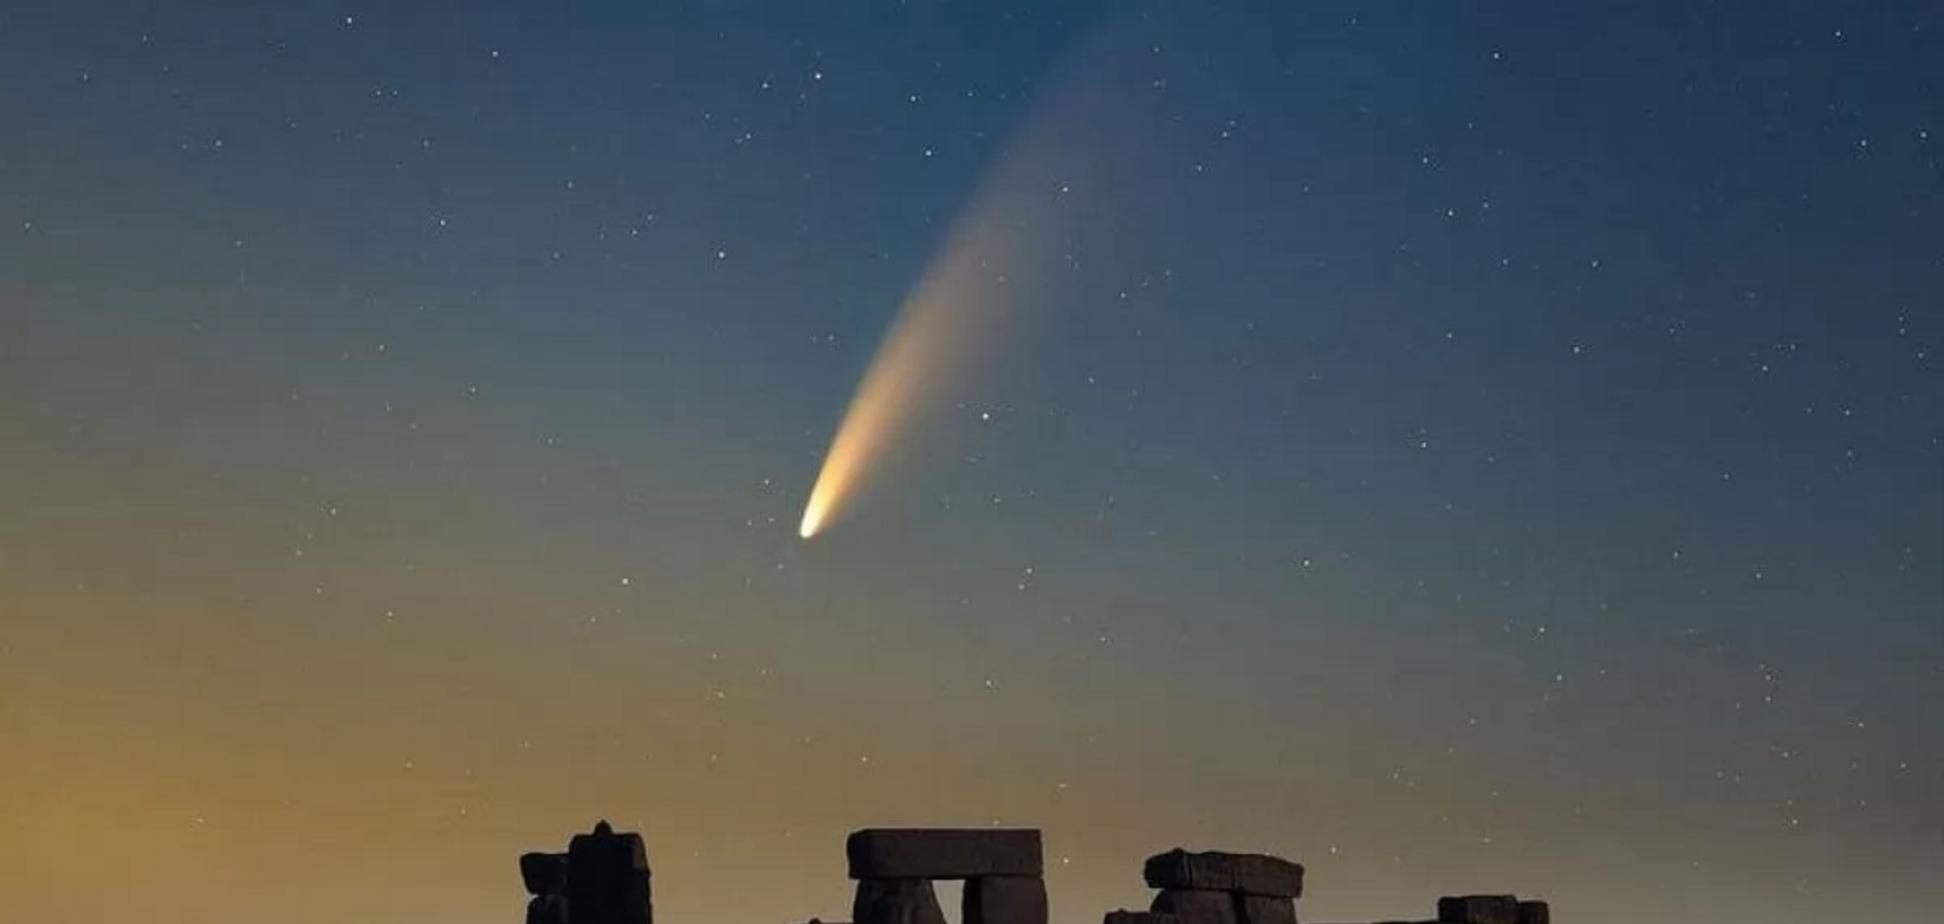 Комета NEOWISE не представляет угрозы Земле